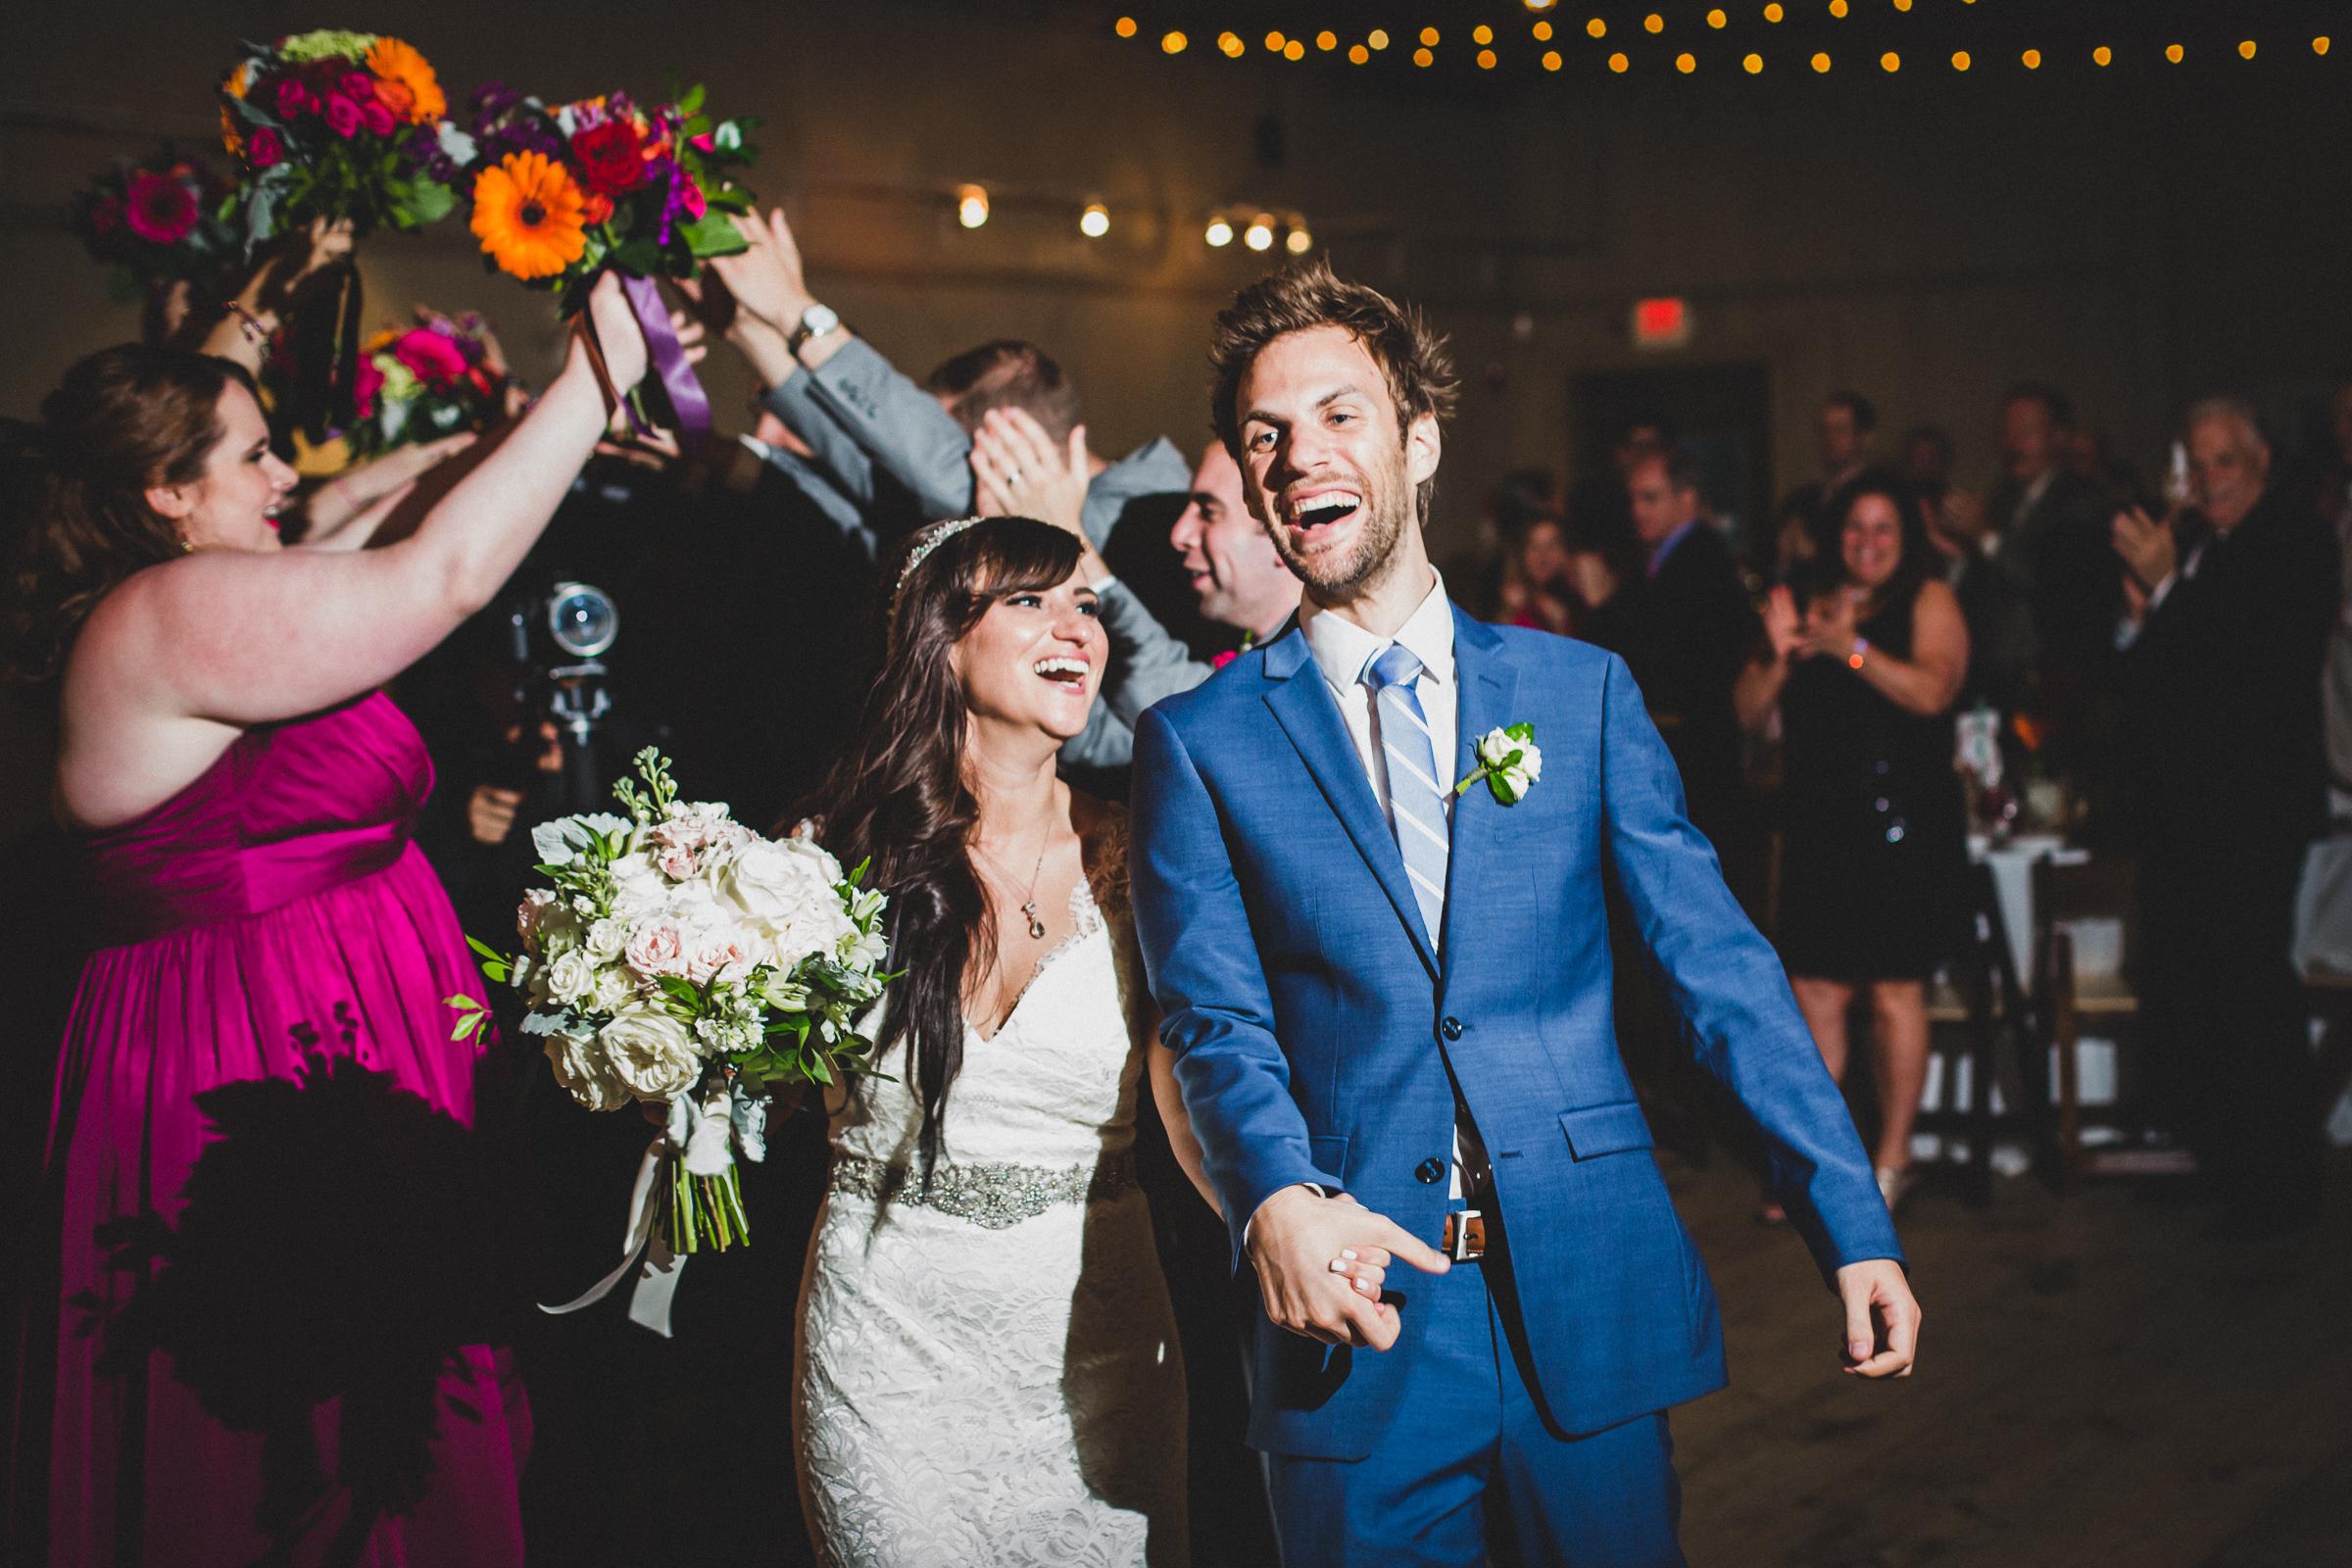 Martha-Clara-Vineyard-Long-Island-Documentary-Wedding-Photographer-72.jpg